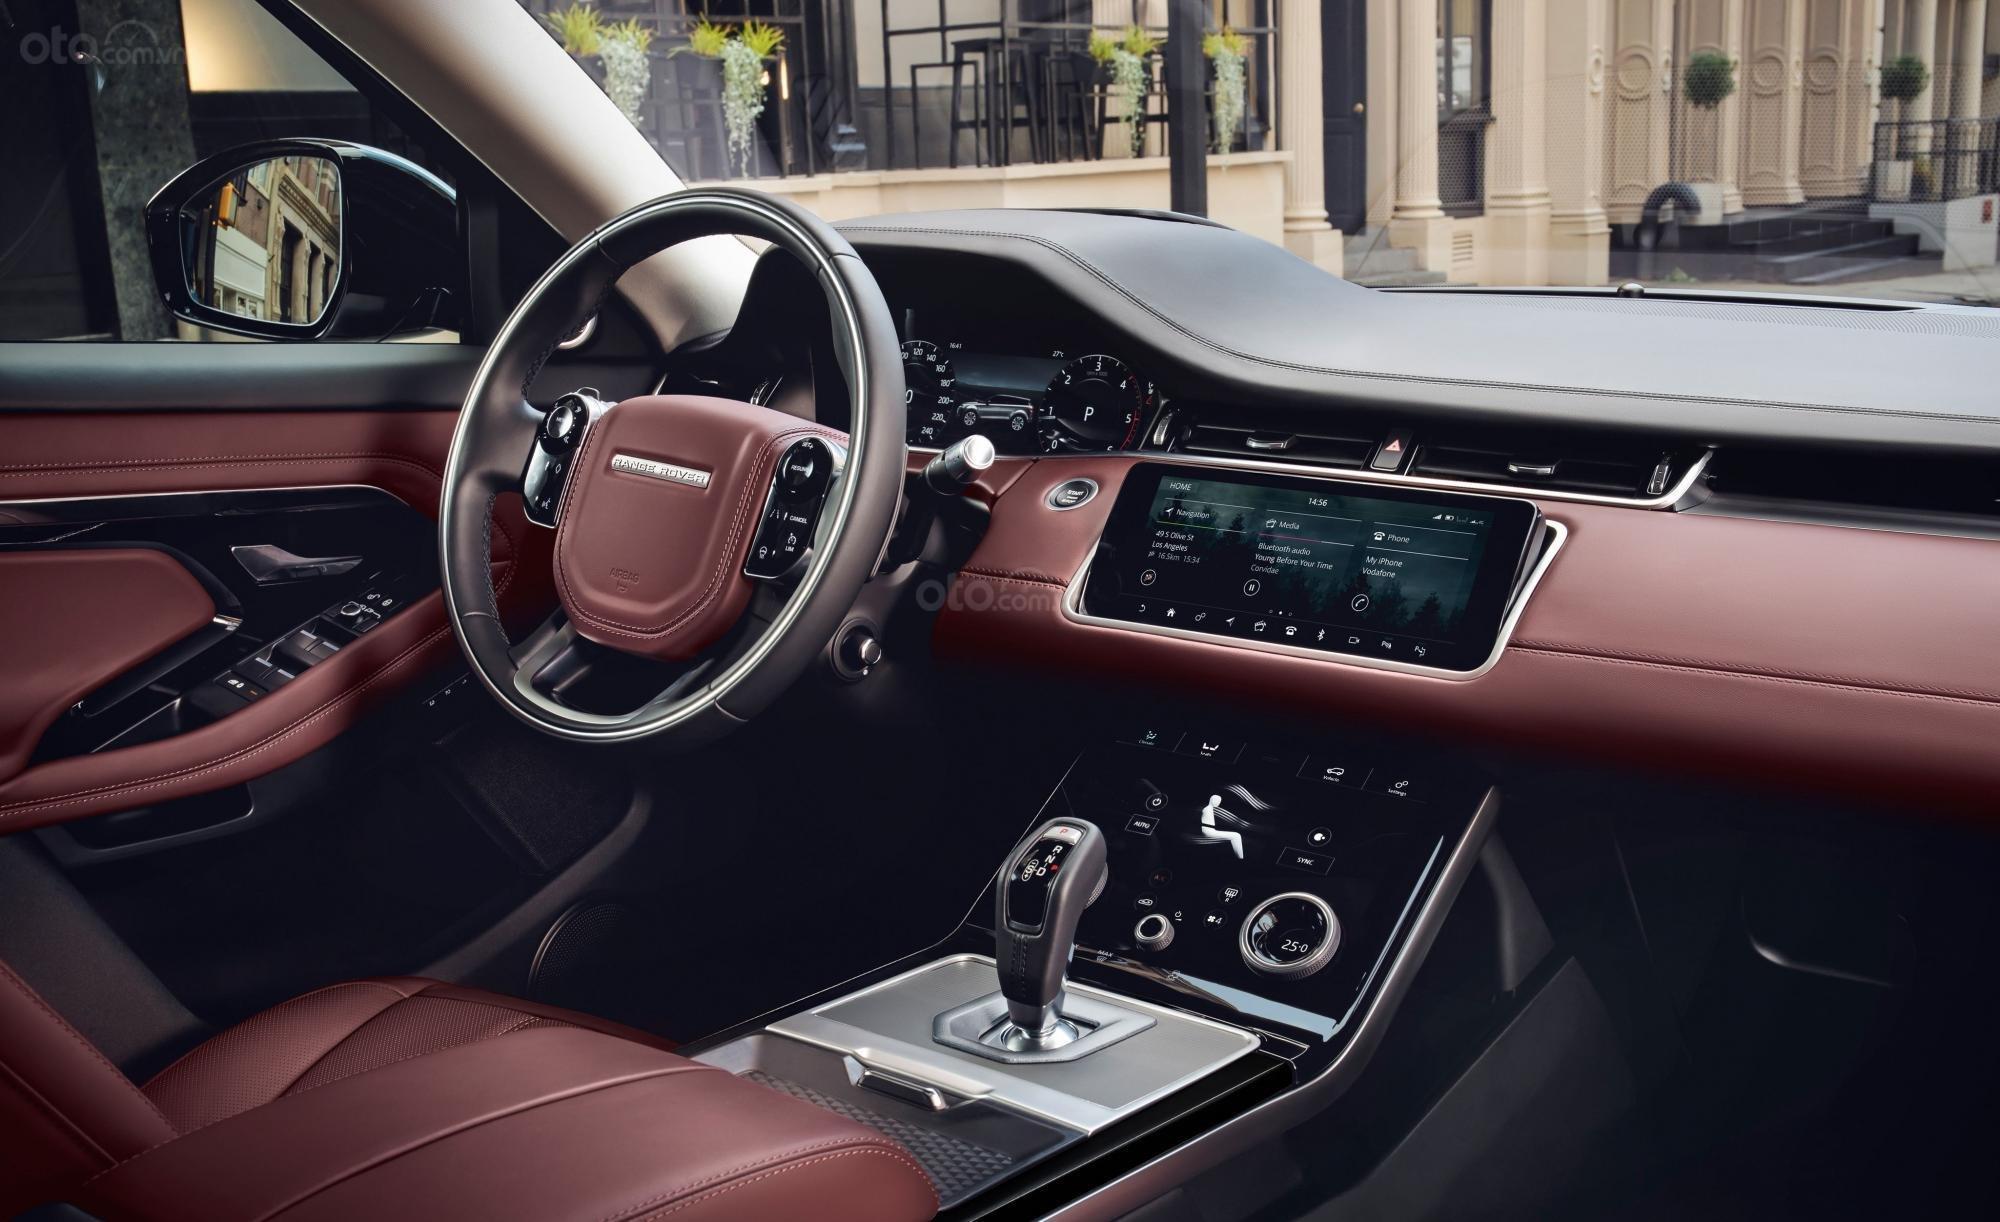 Land Rover Range Rover Evoque 2020 nội thất